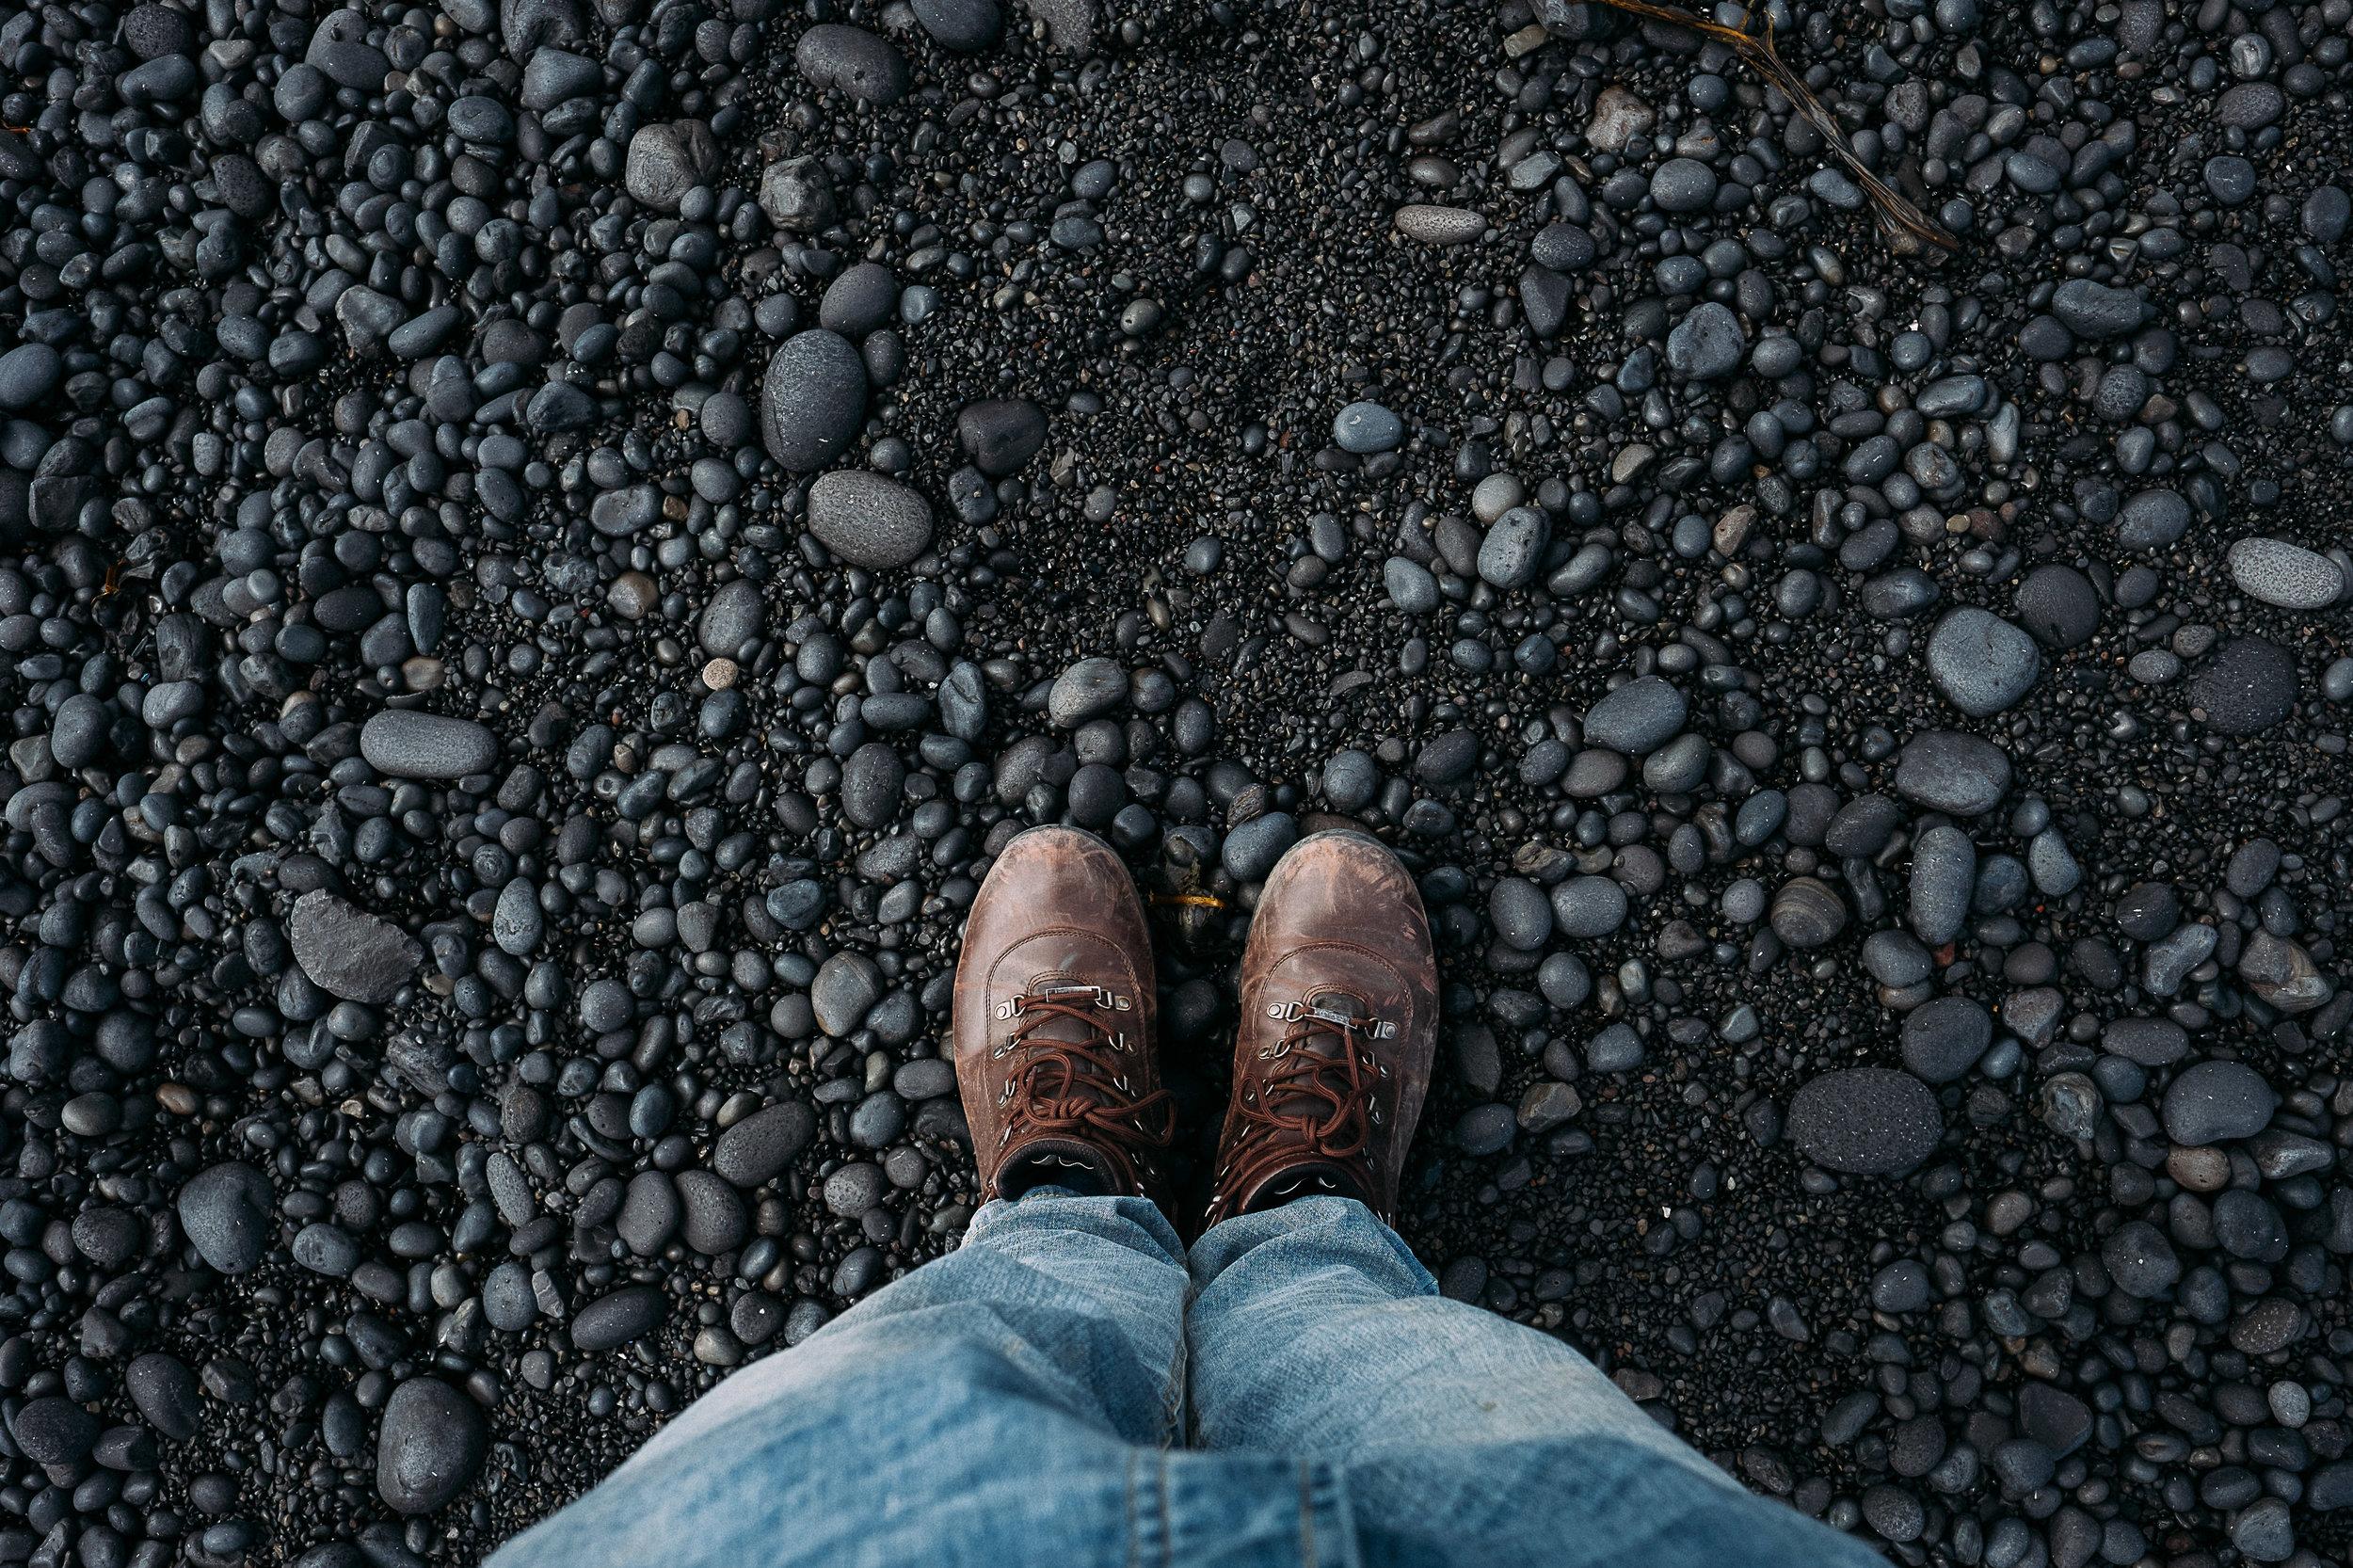 iceland feet-35.jpg